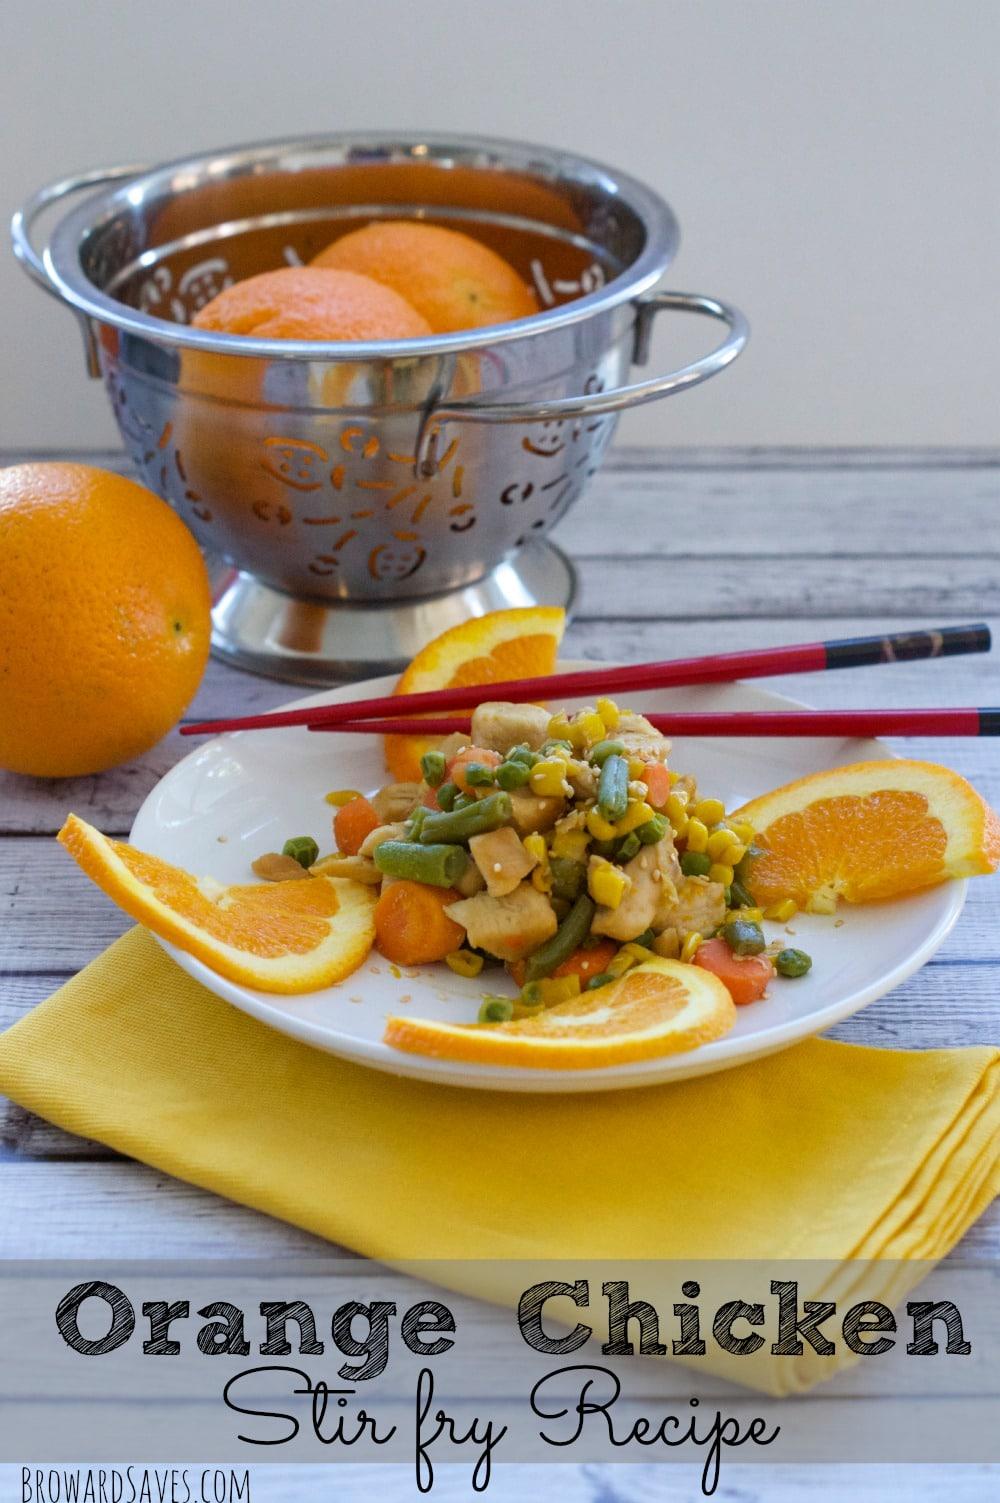 orange-chicken-stir-fry-recipe-cover